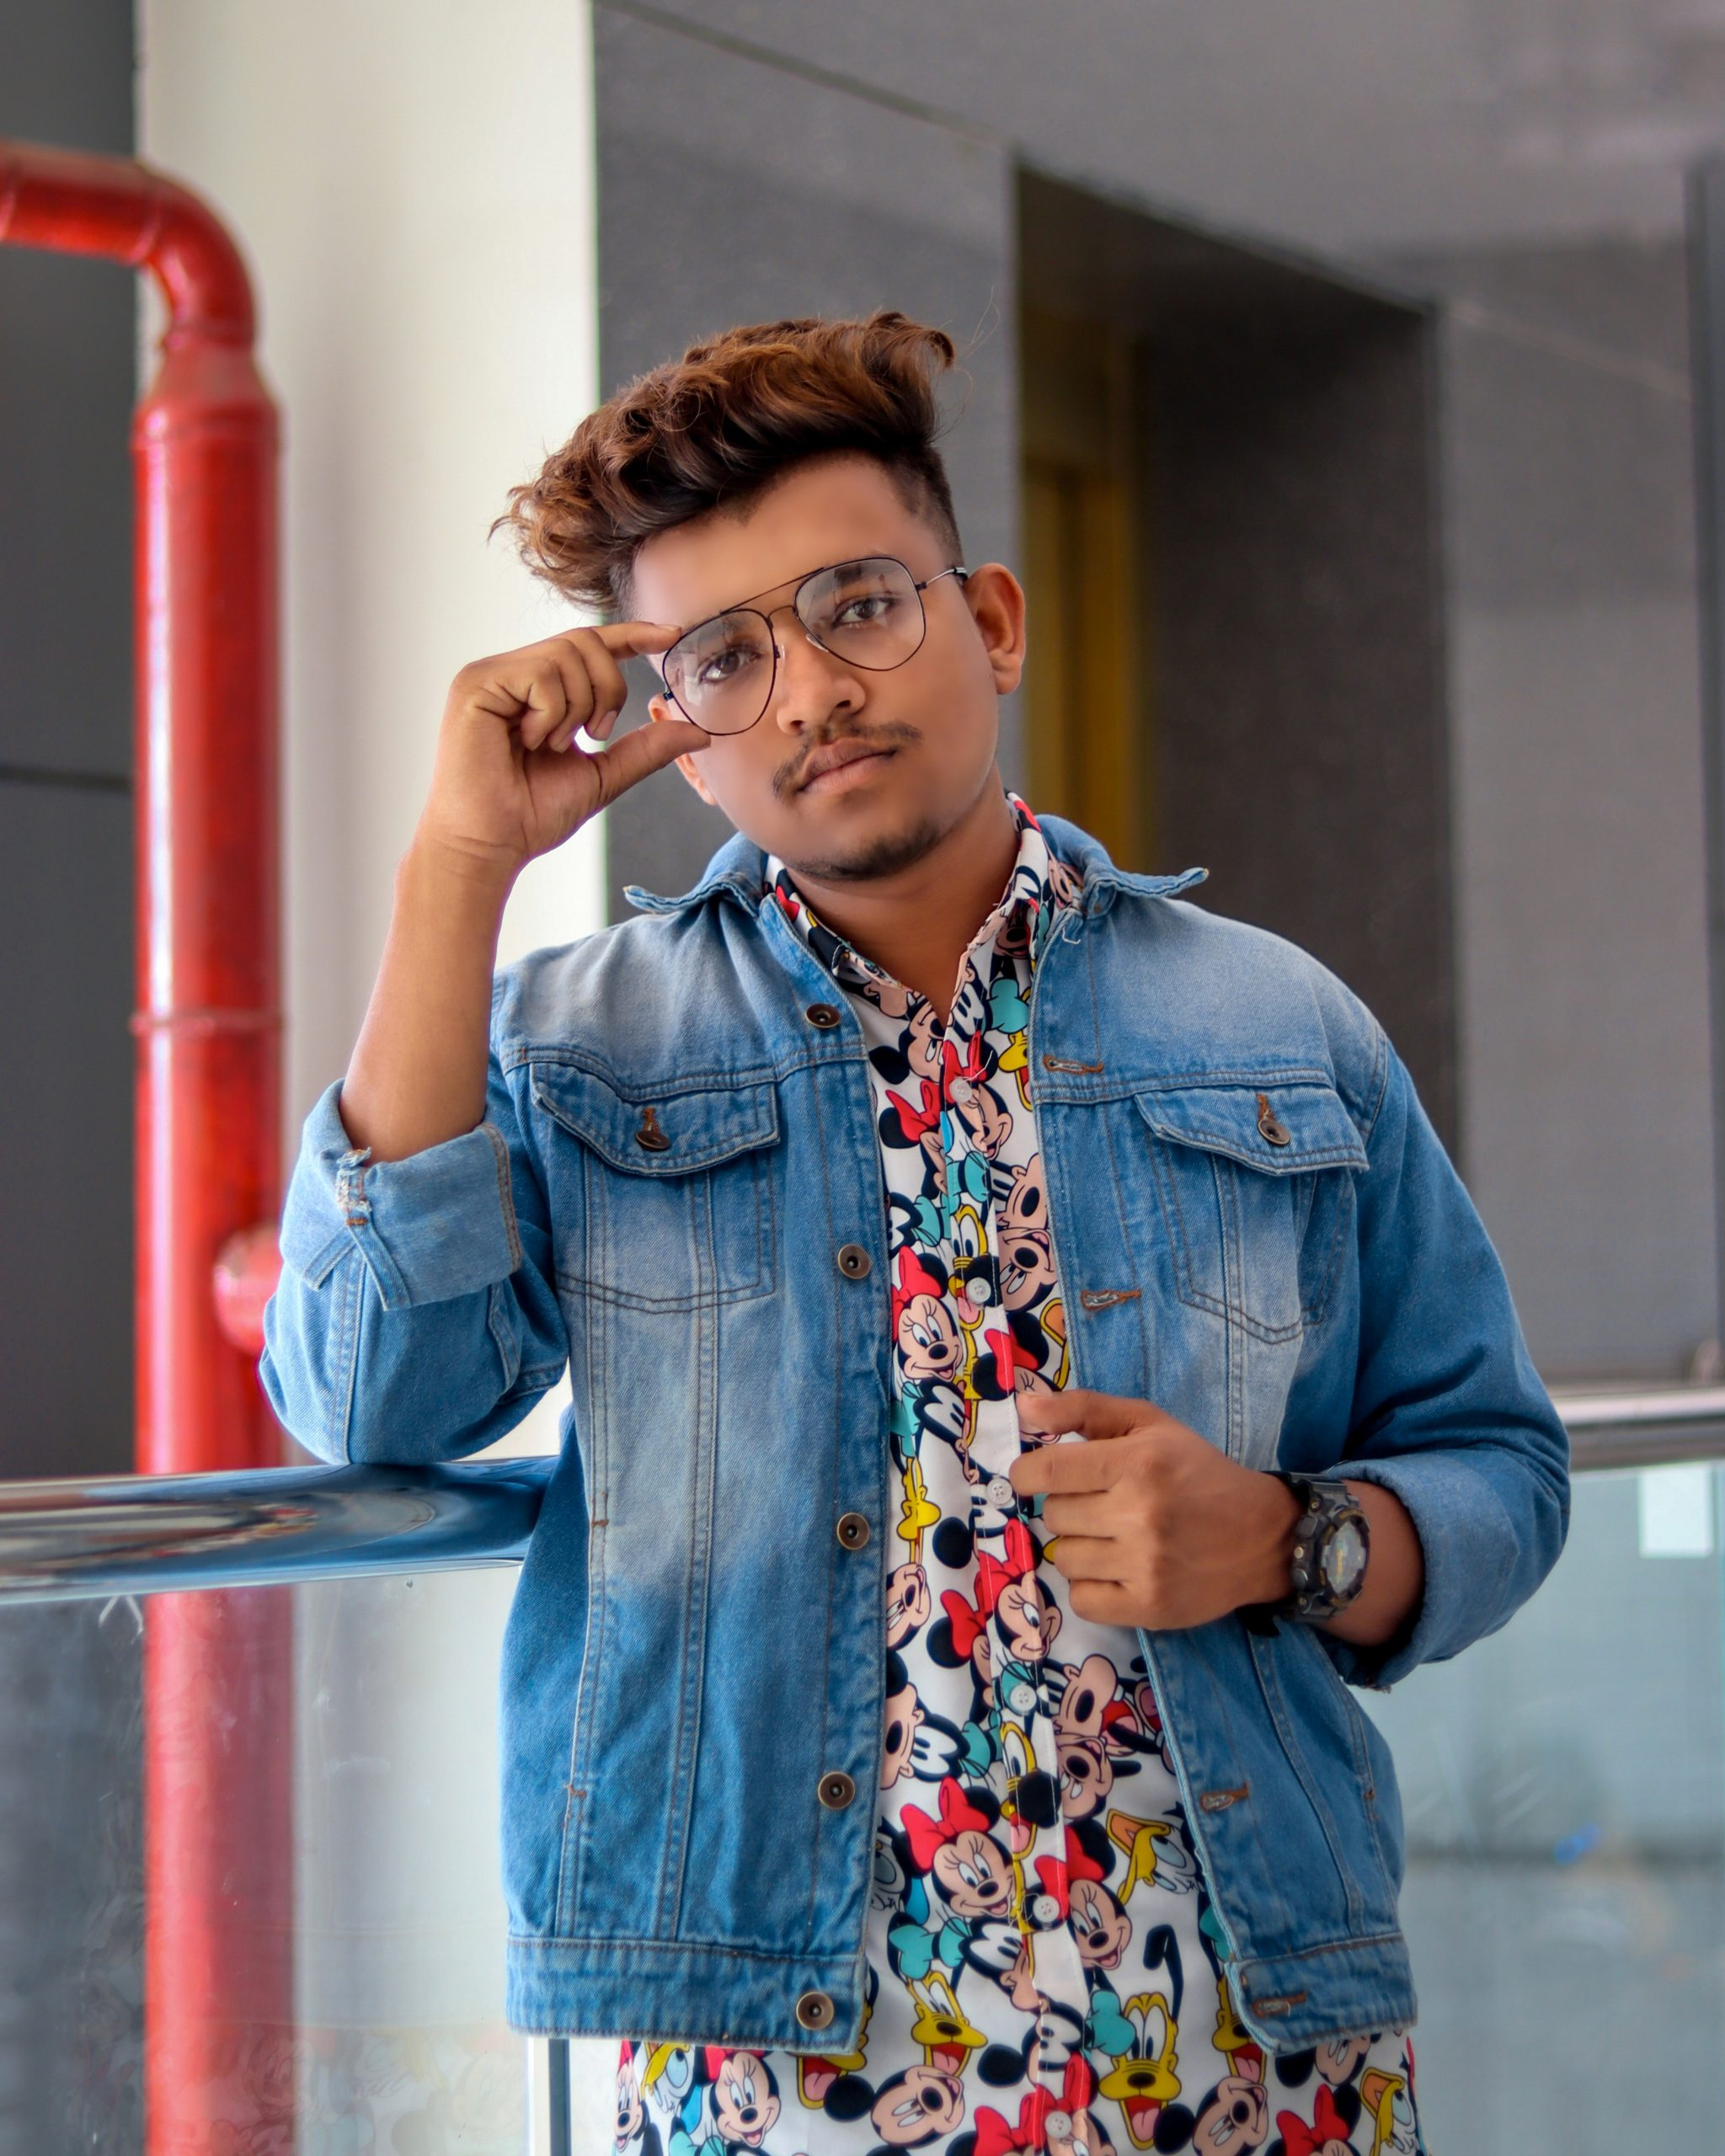 A stylish boy posing with specs